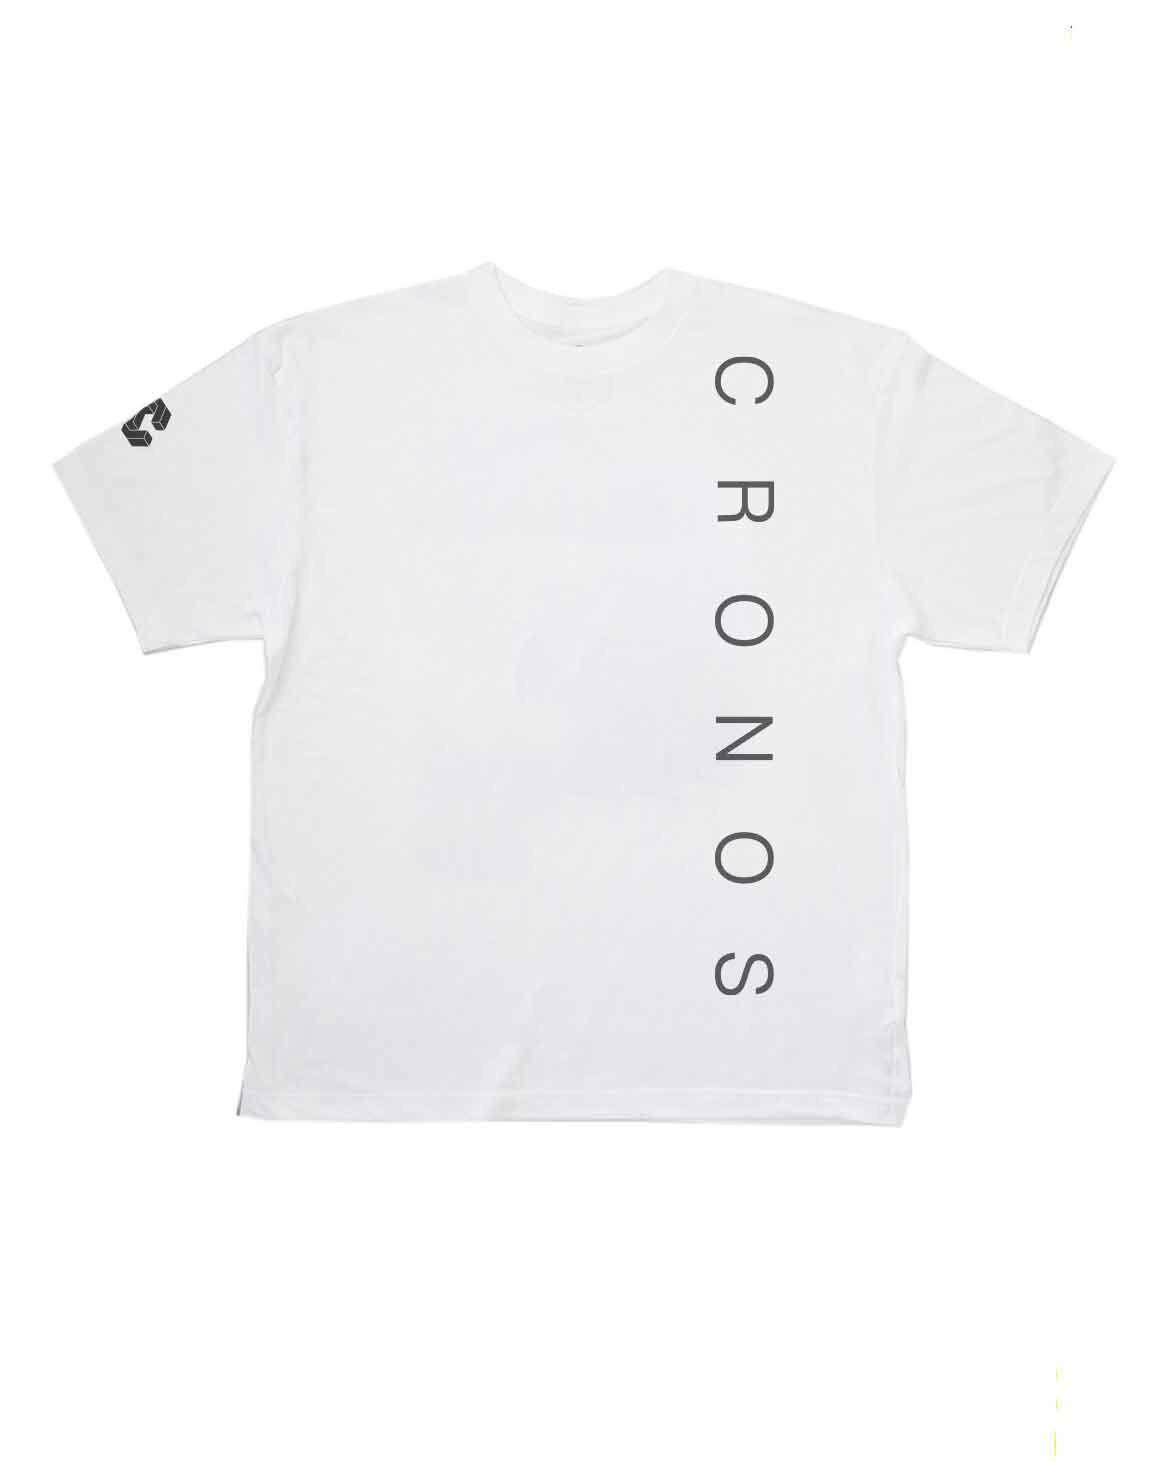 CRONOS SIMPLE LOGO T-SHIRTS【WHITE】